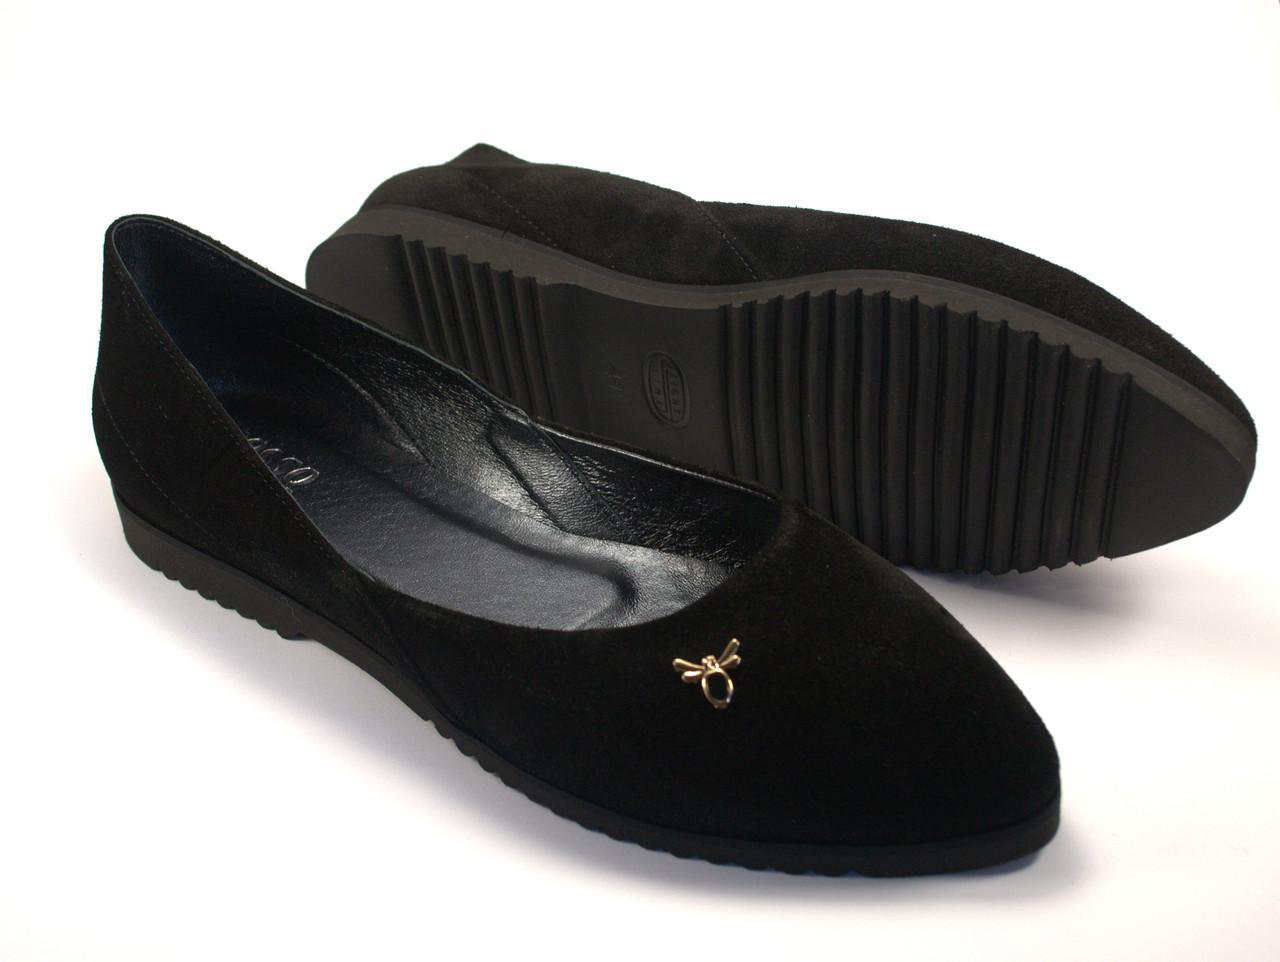 6e6785829c6b Балетки женские большого размера замшевые Scarab V Gold Black Vel by Rosso  Avangard BS цвет черный